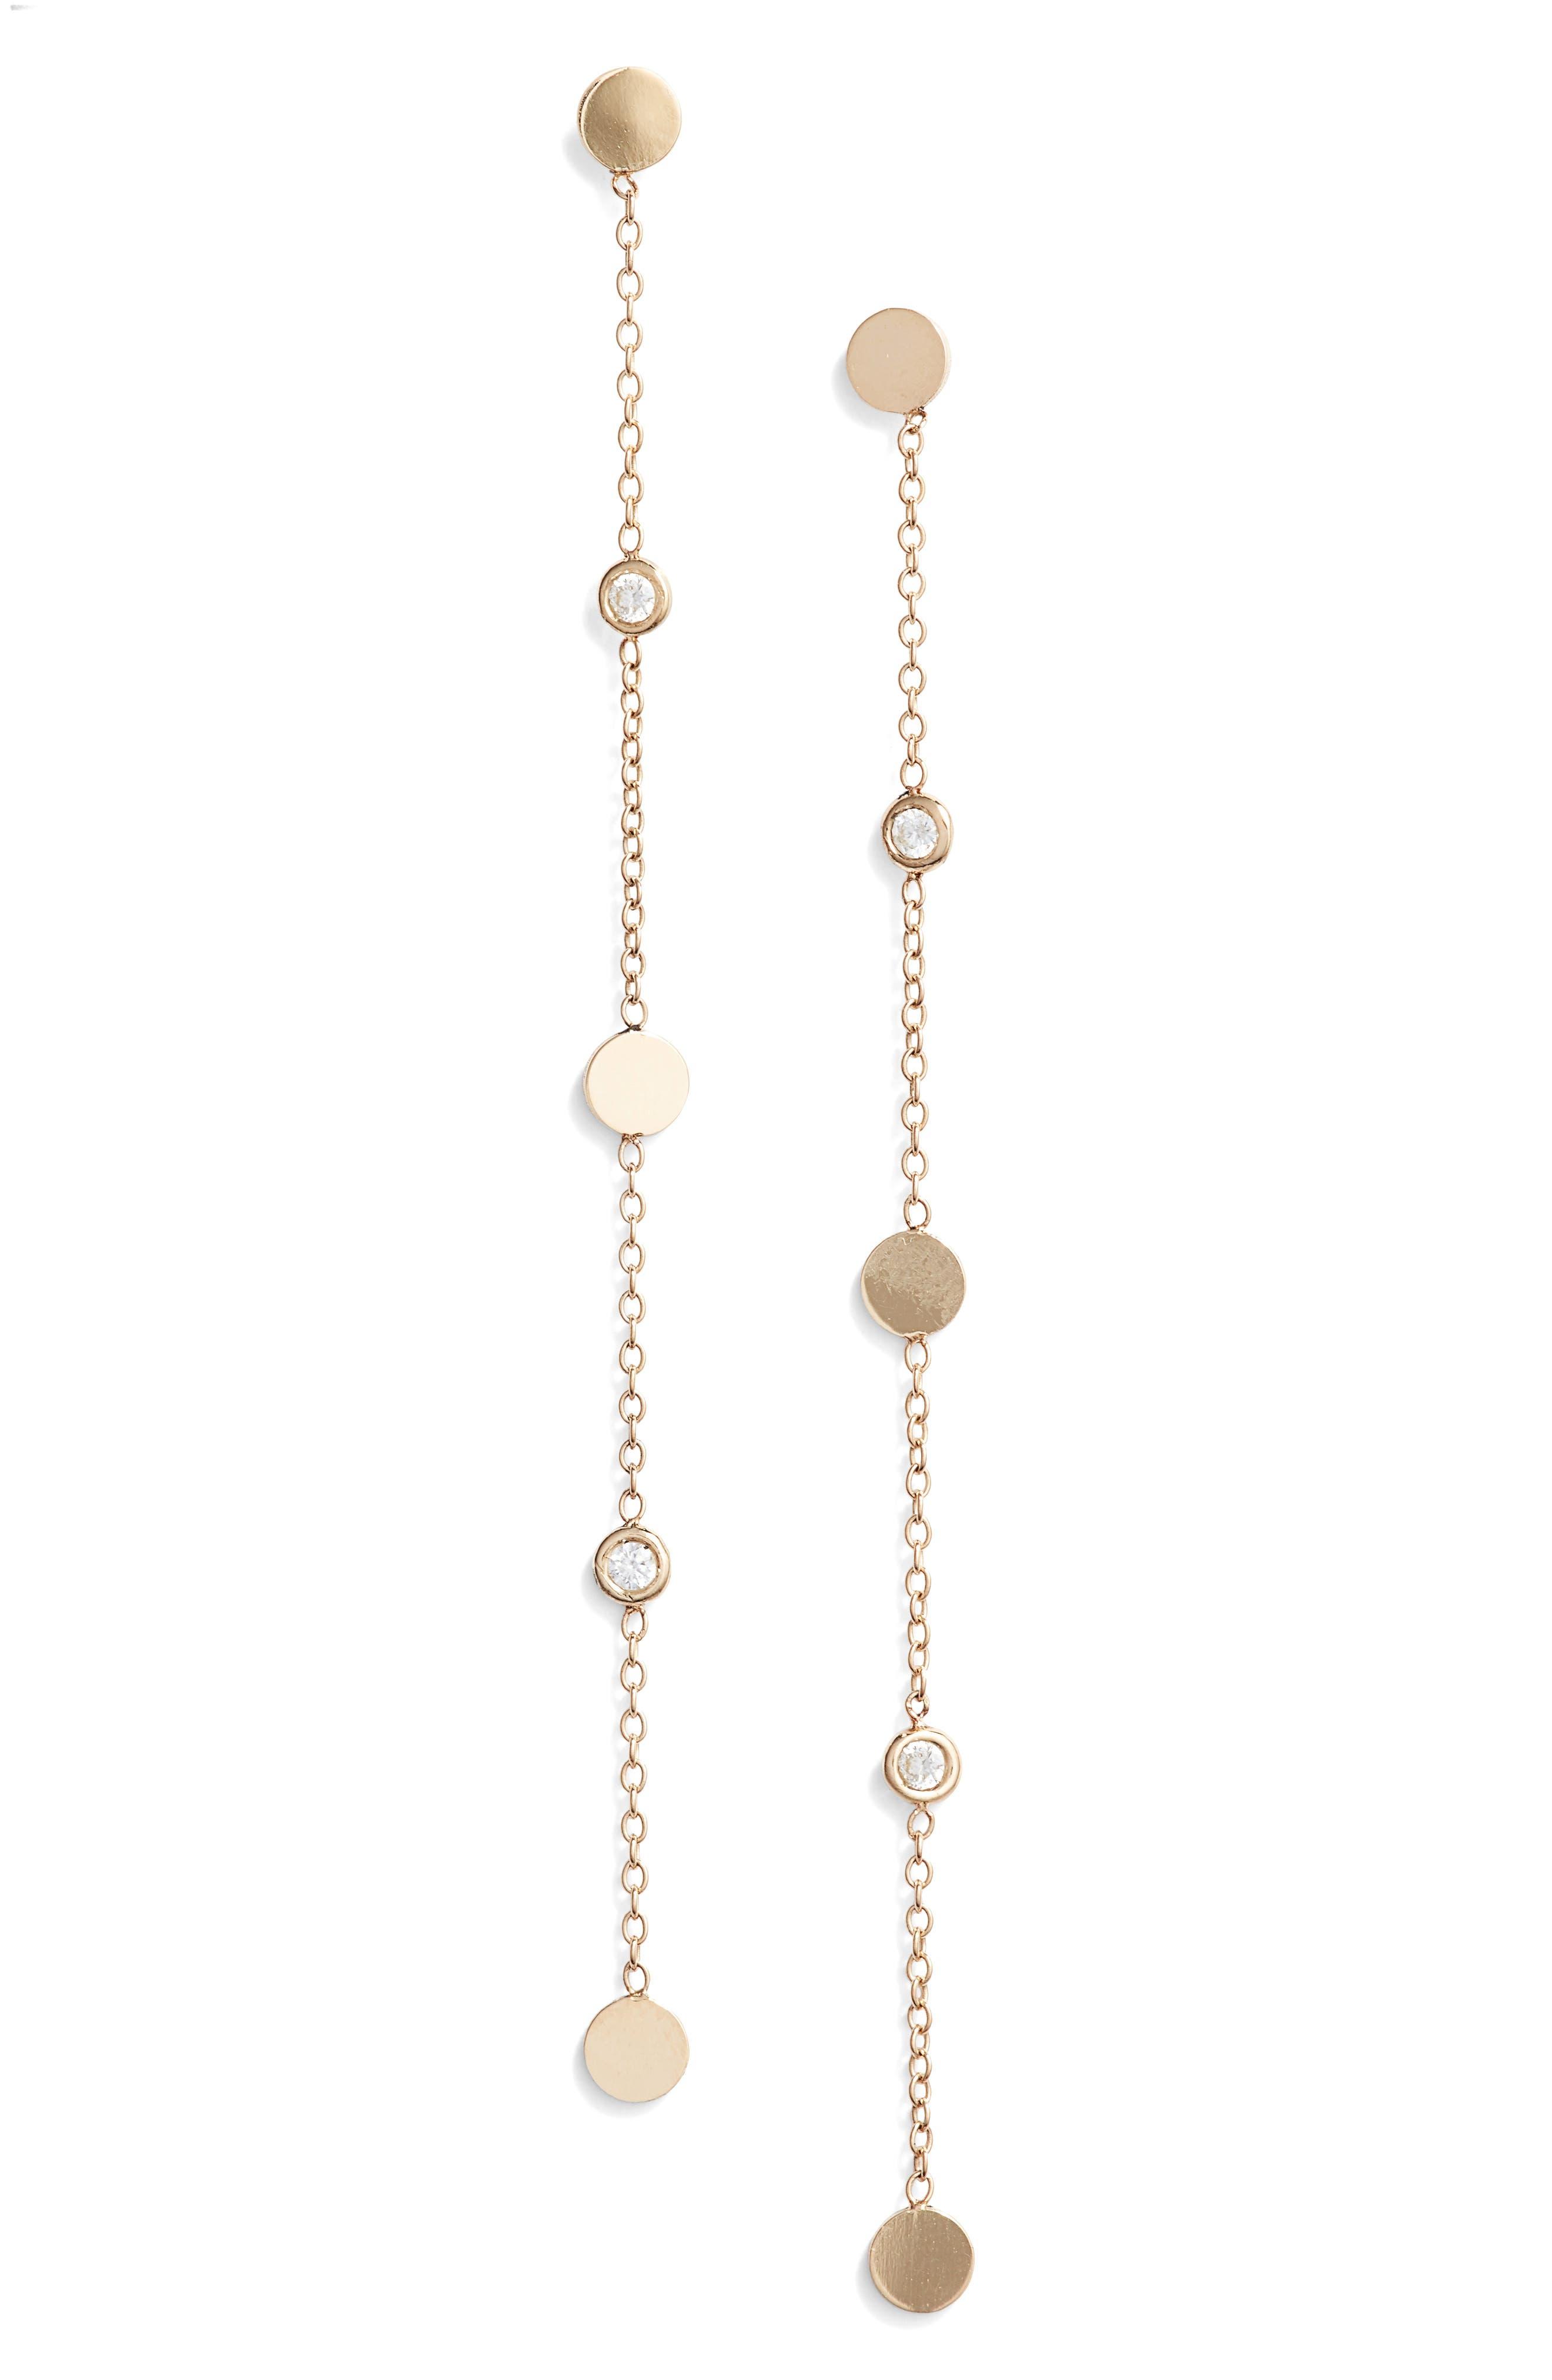 Zoe Chicco Linear Diamond Chain Earrings